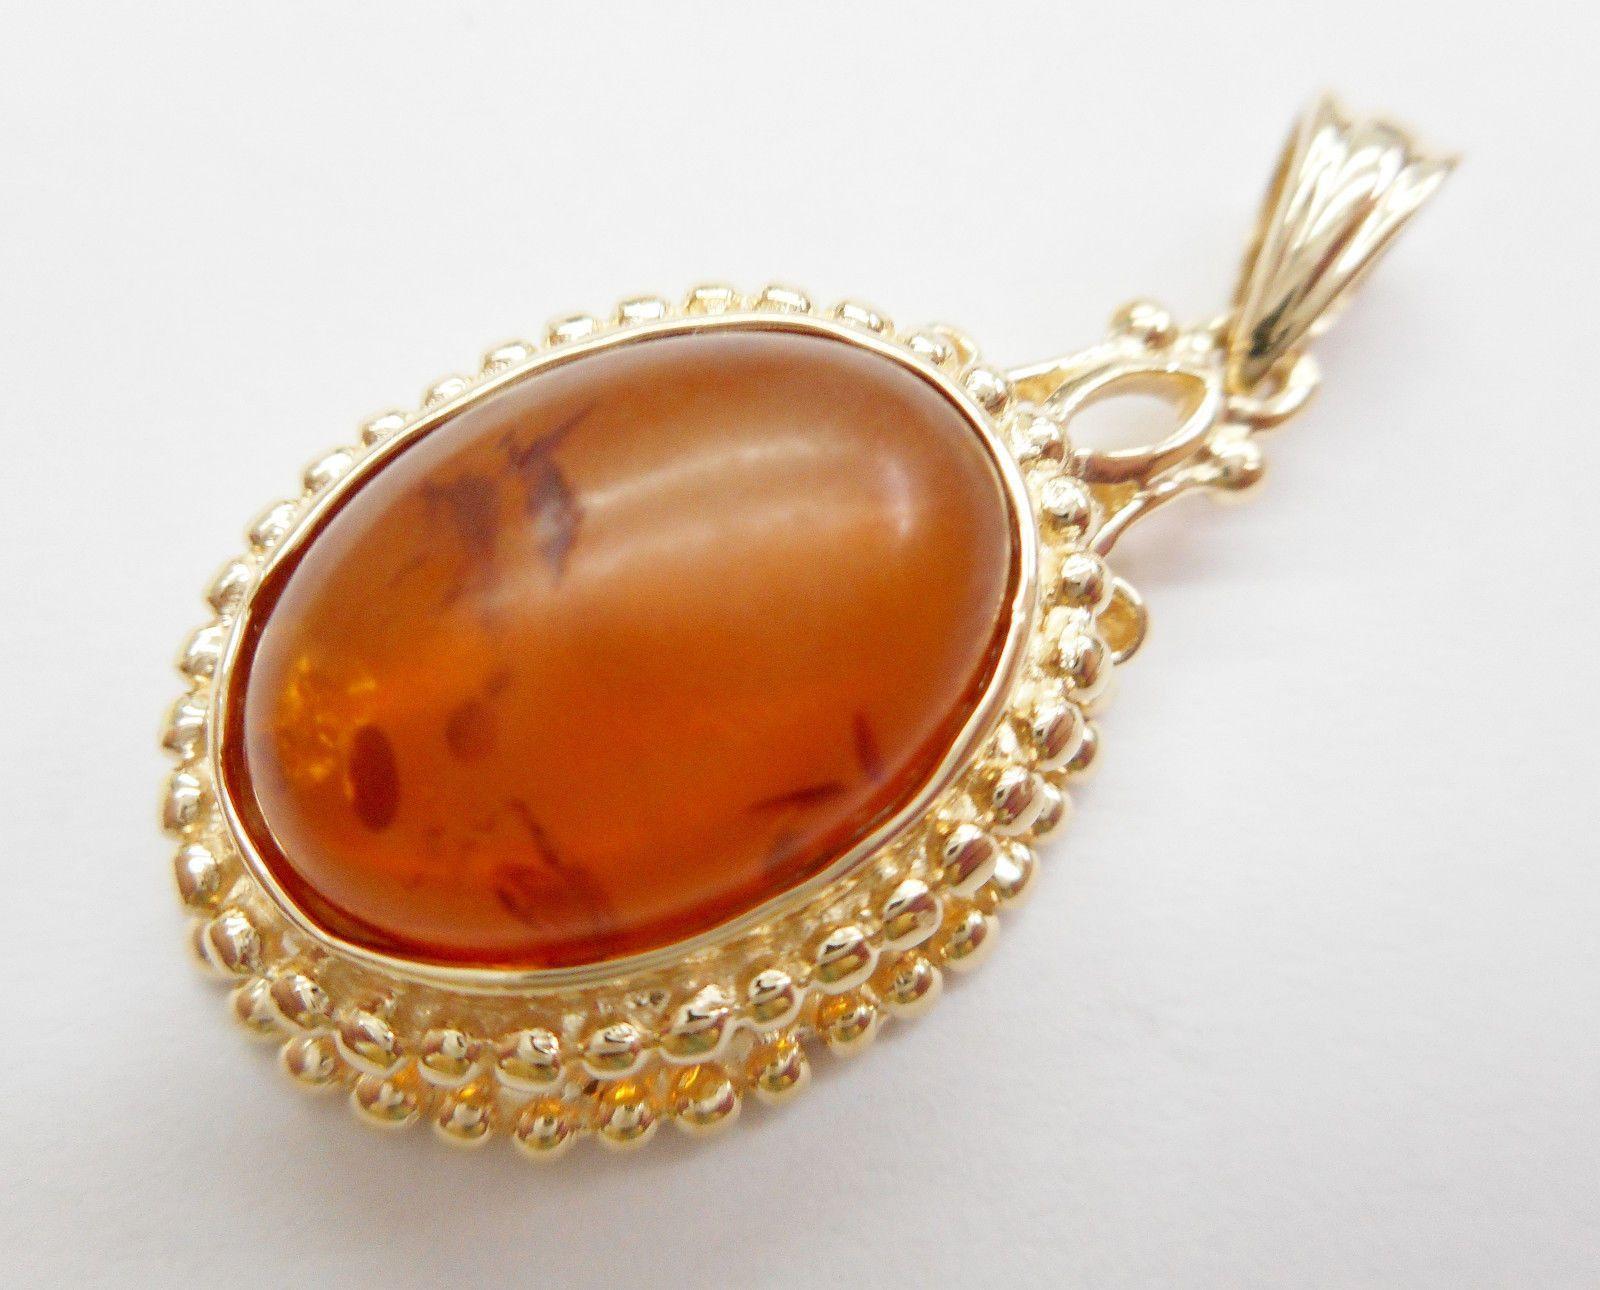 Sale gorgeous genuine 14k yellow gold fancy amber pendant 1775 sale gorgeous genuine 14k yellow gold fancy amber pendant 1775 aloadofball Images